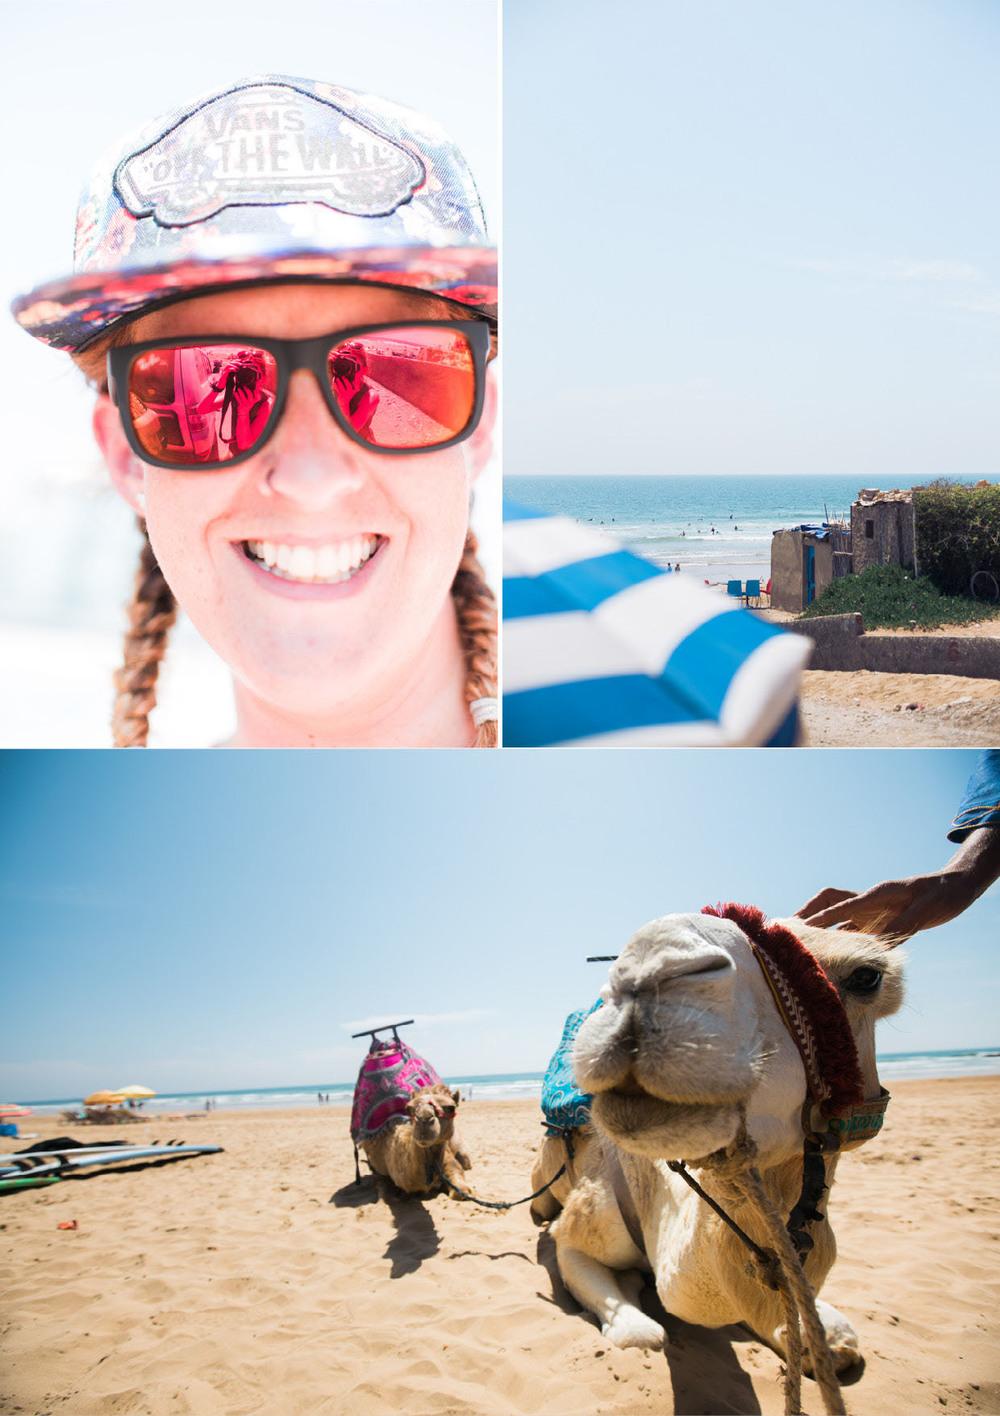 Surf_Star_Morocco19.jpg